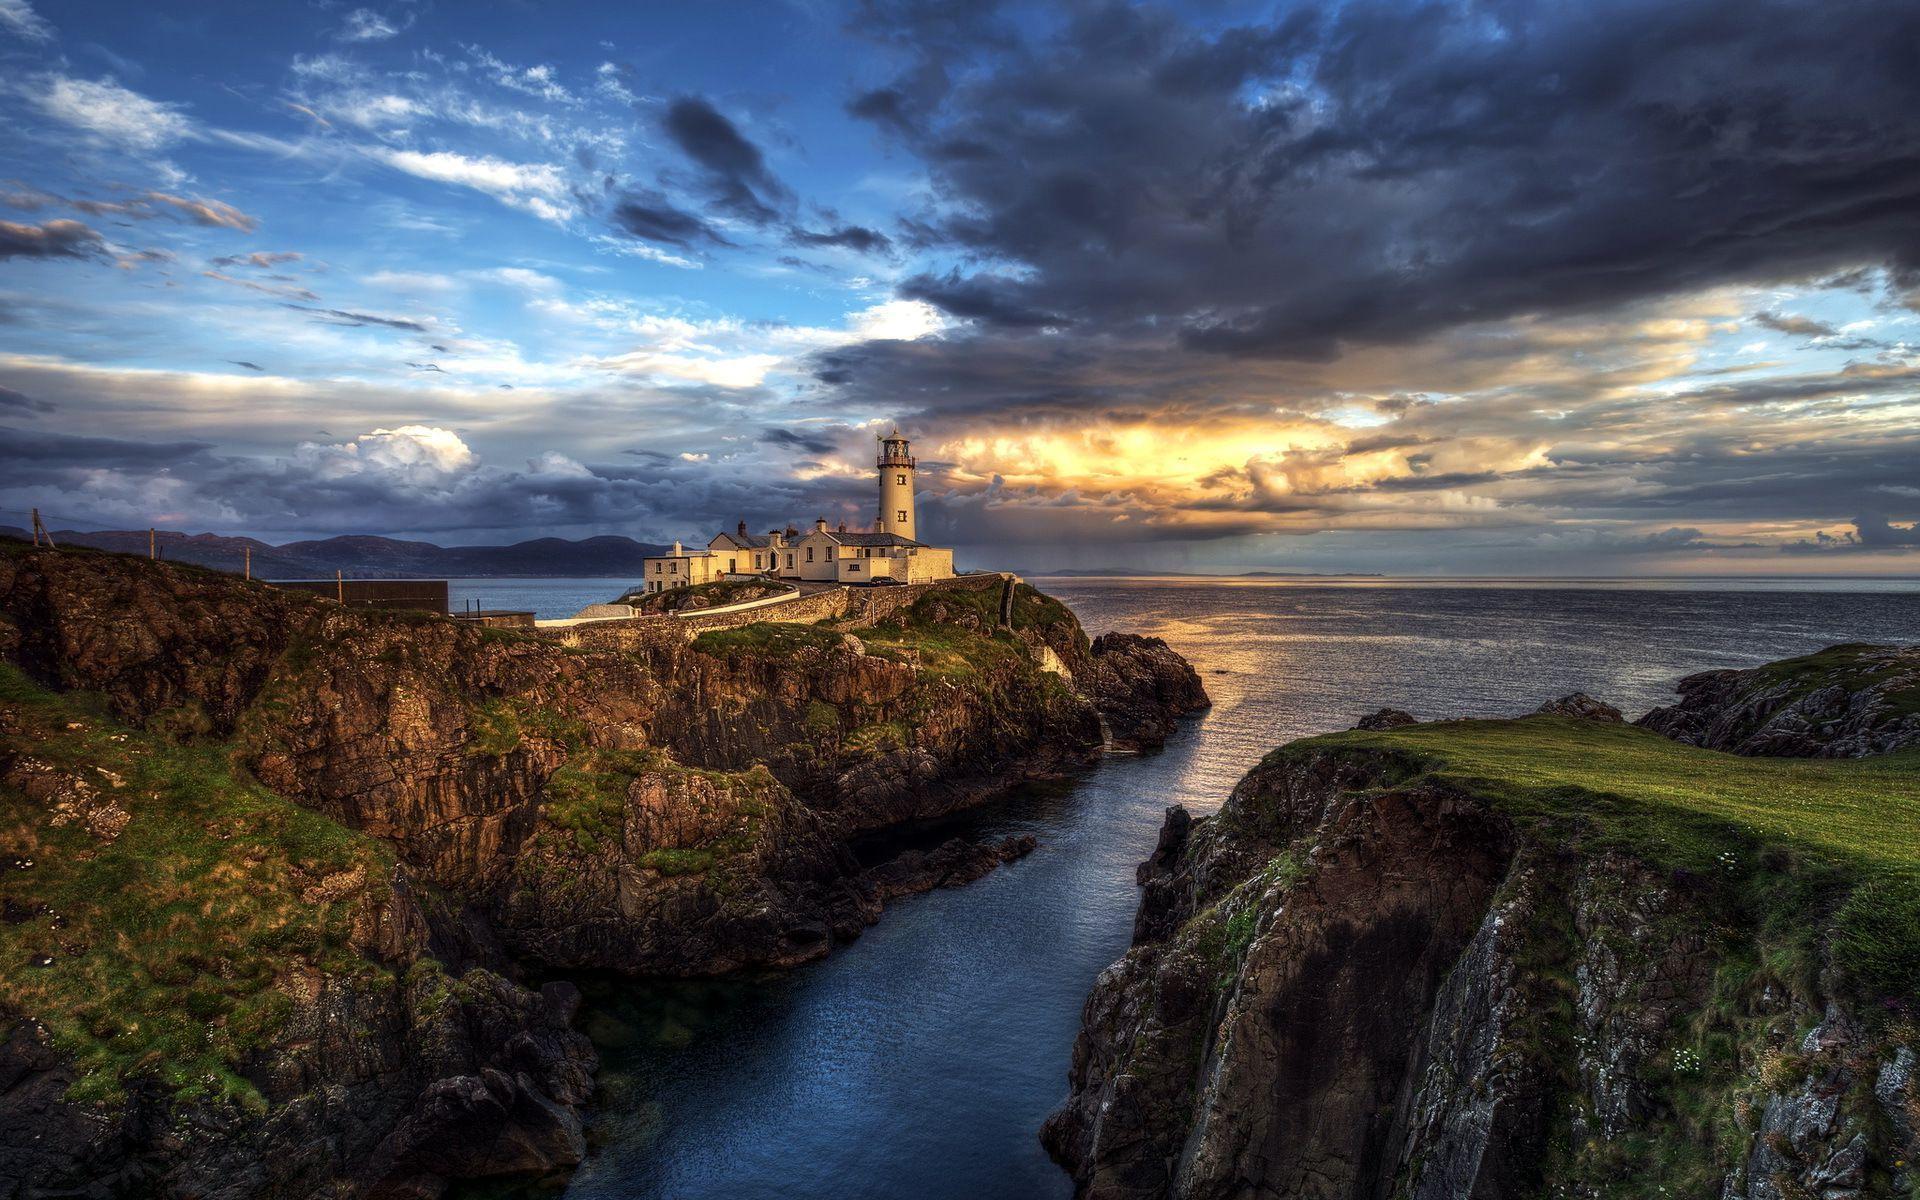 Irlande-nature-paysage-eau-ruisseau-mer-phare.jpg